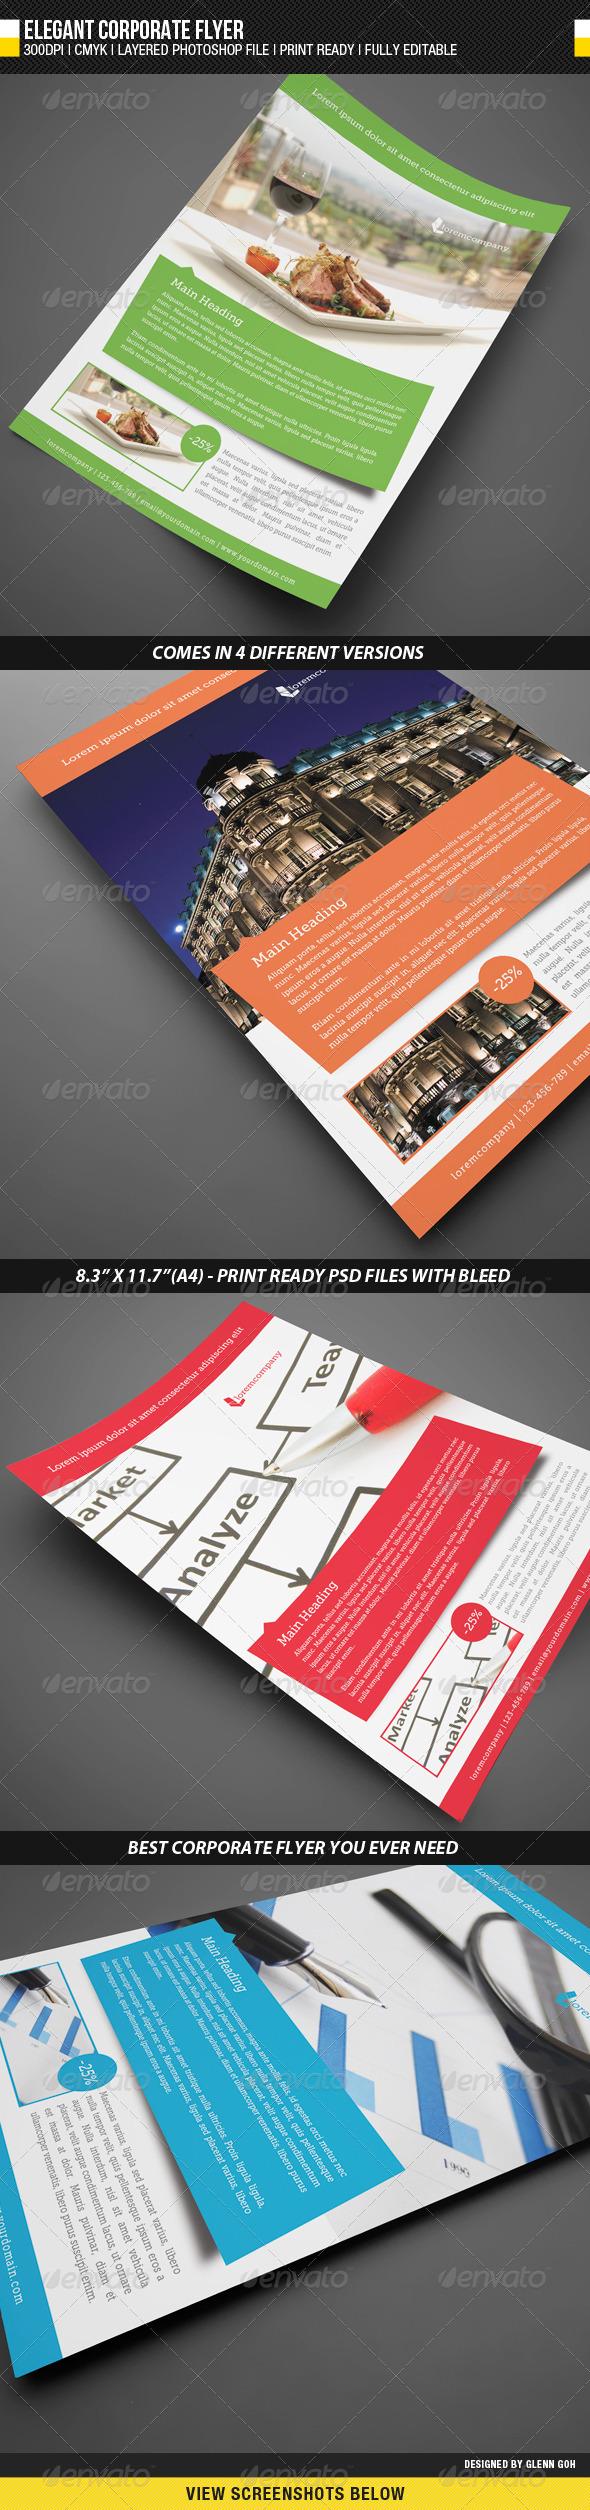 GraphicRiver Elegant Corporate Flyer 2013305